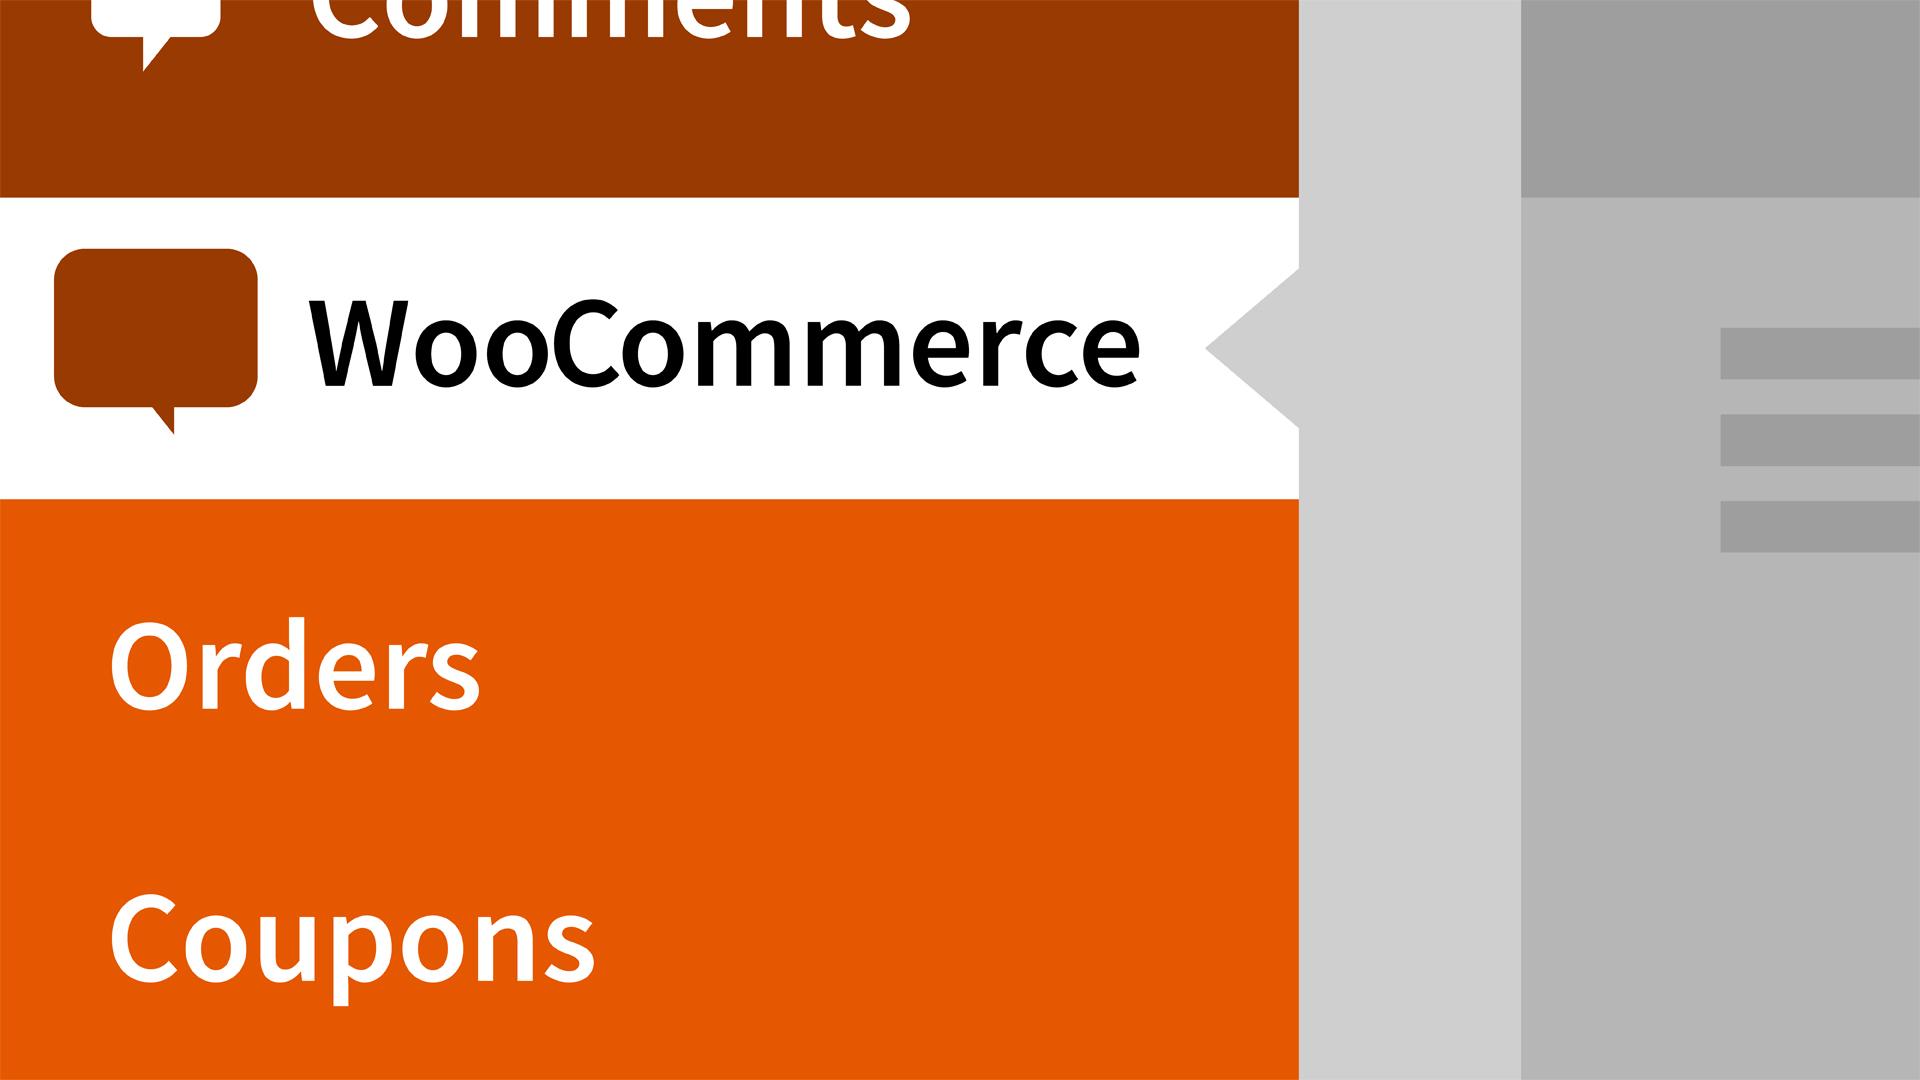 WooCommerce Online Courses   LinkedIn Learning, formerly Lynda com